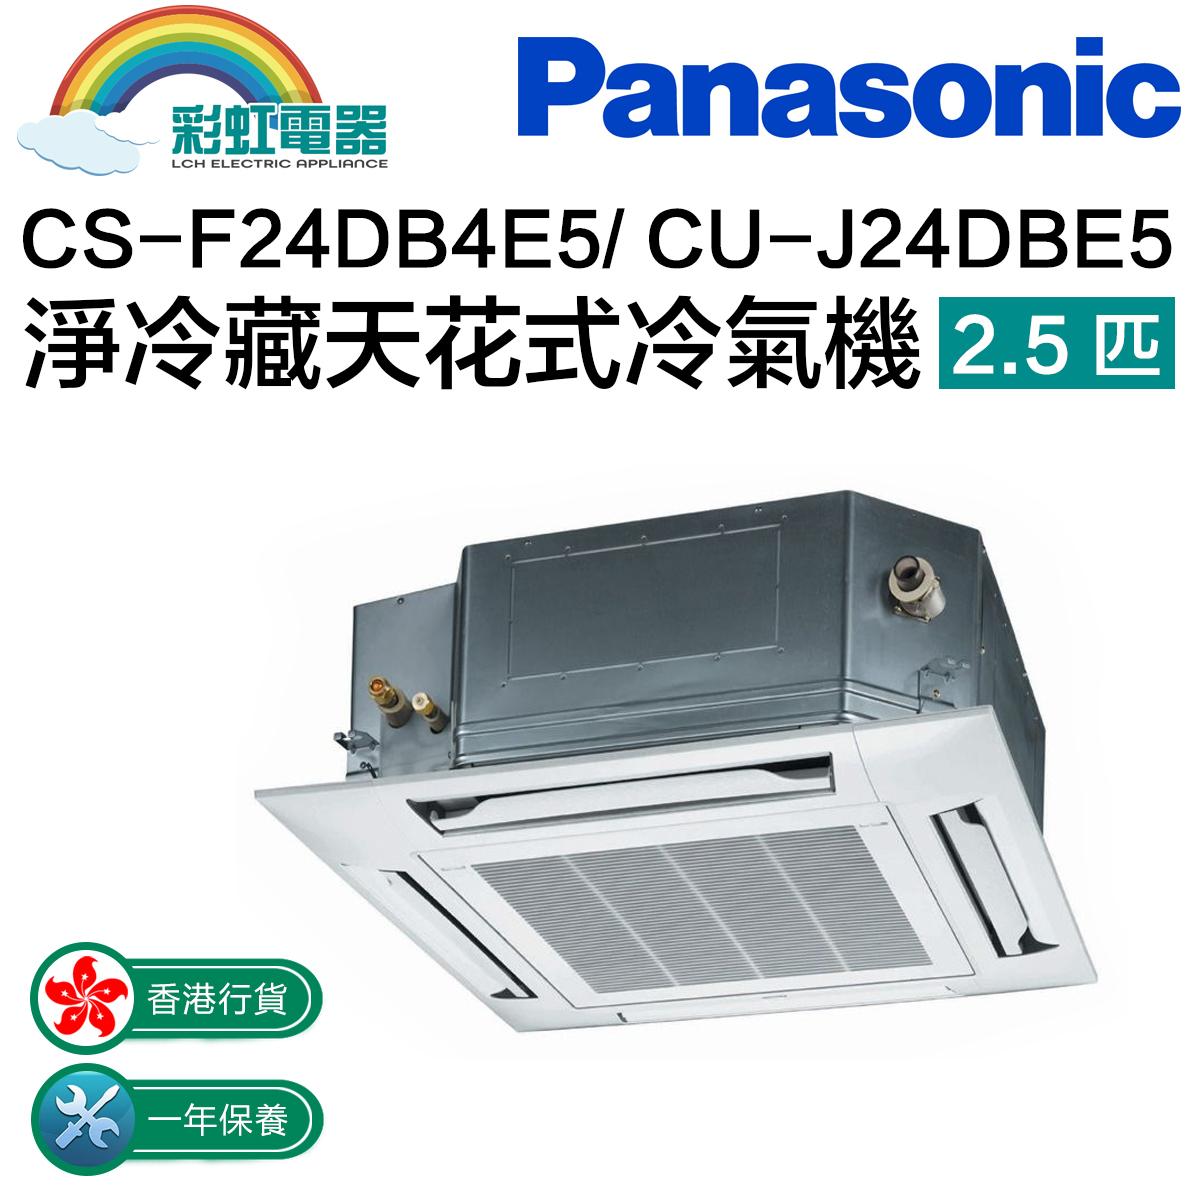 CS-F24DB4E5/ CU-J24DBE5 net refrigerating day fancy air conditioner 2.5 horse